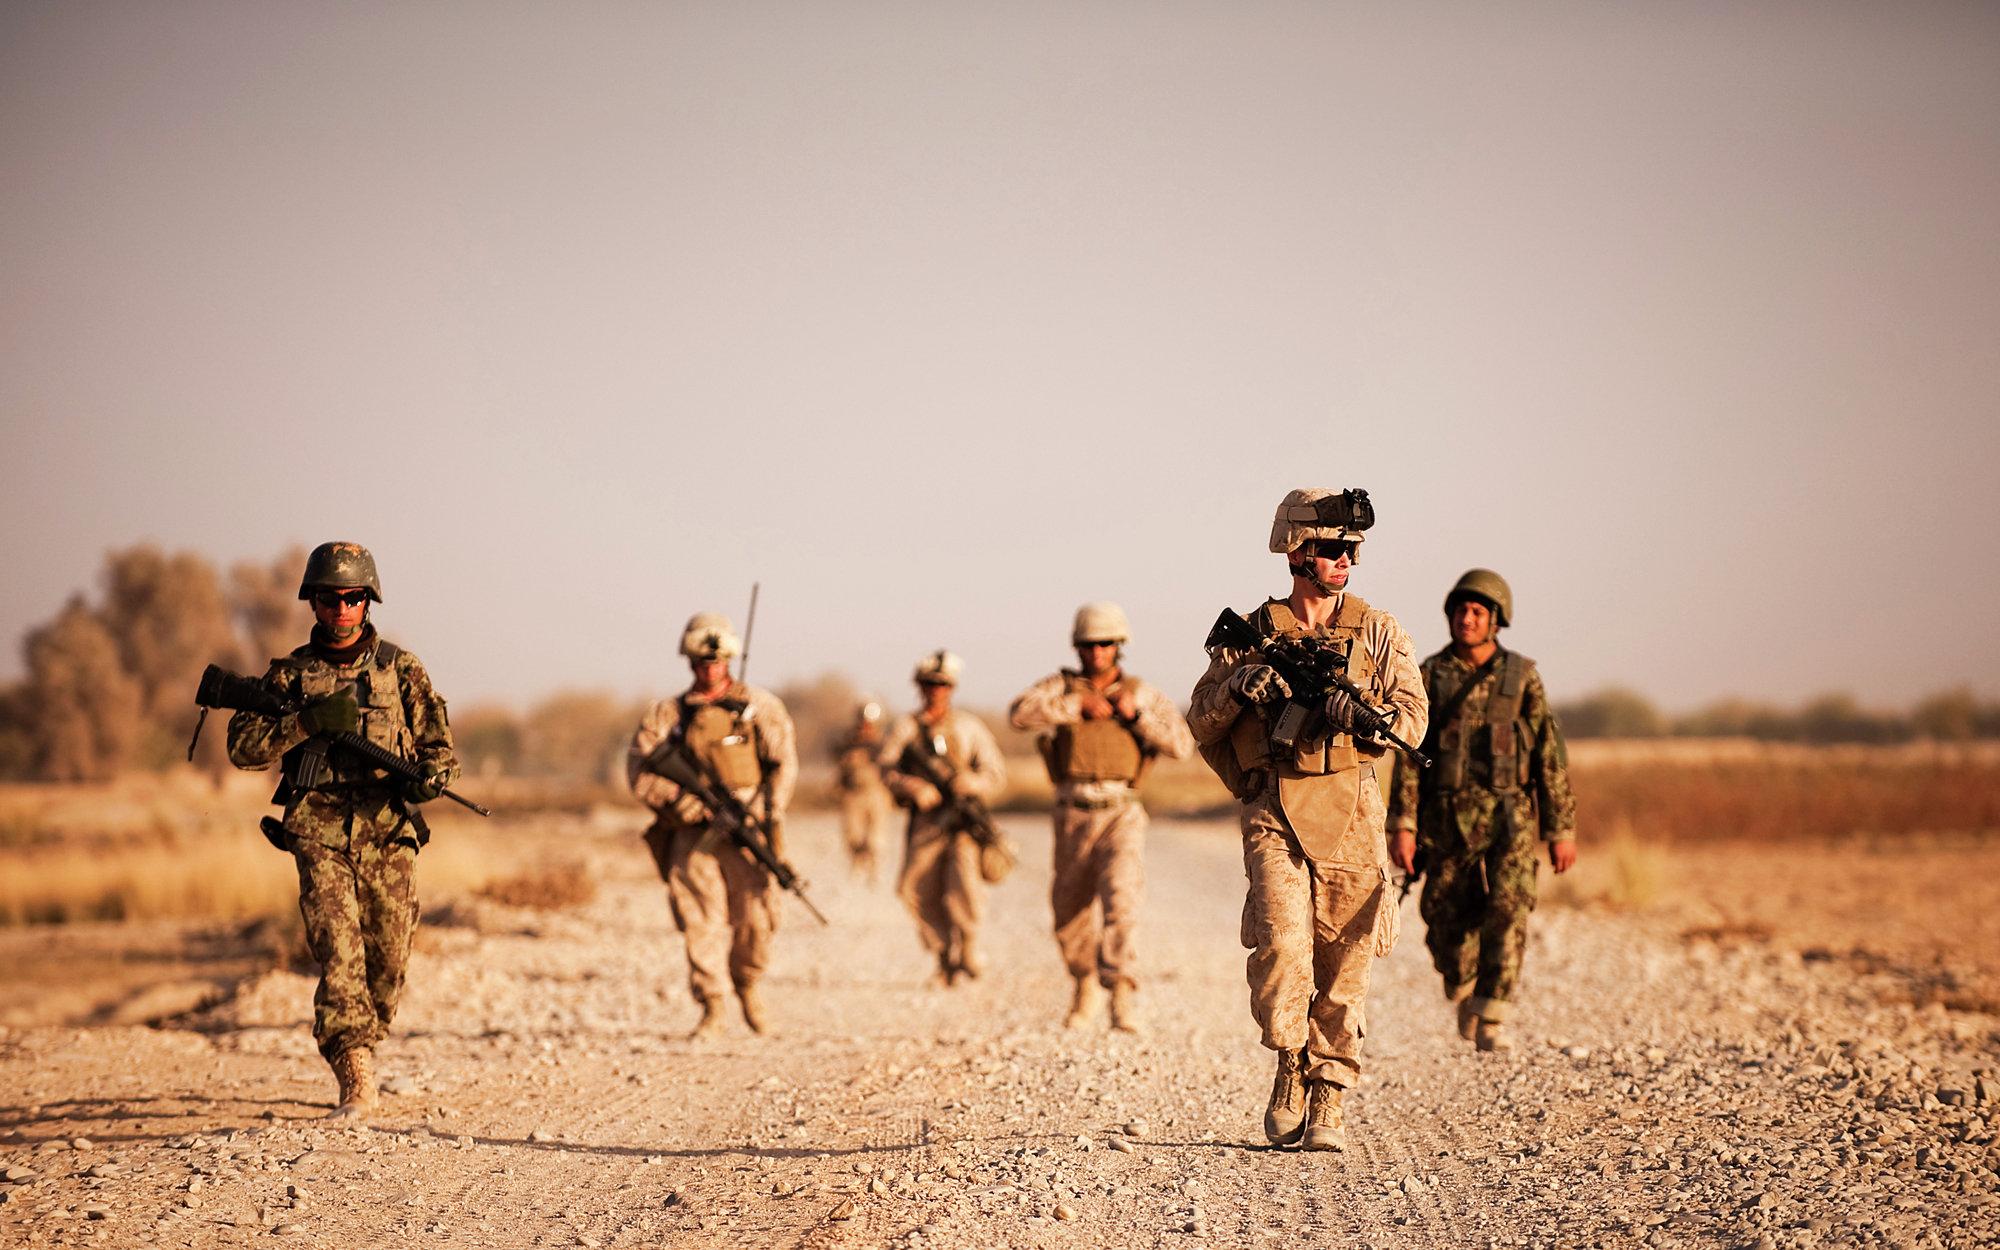 операция ISAF, НАТО, Афганистан, провинция Гельменд